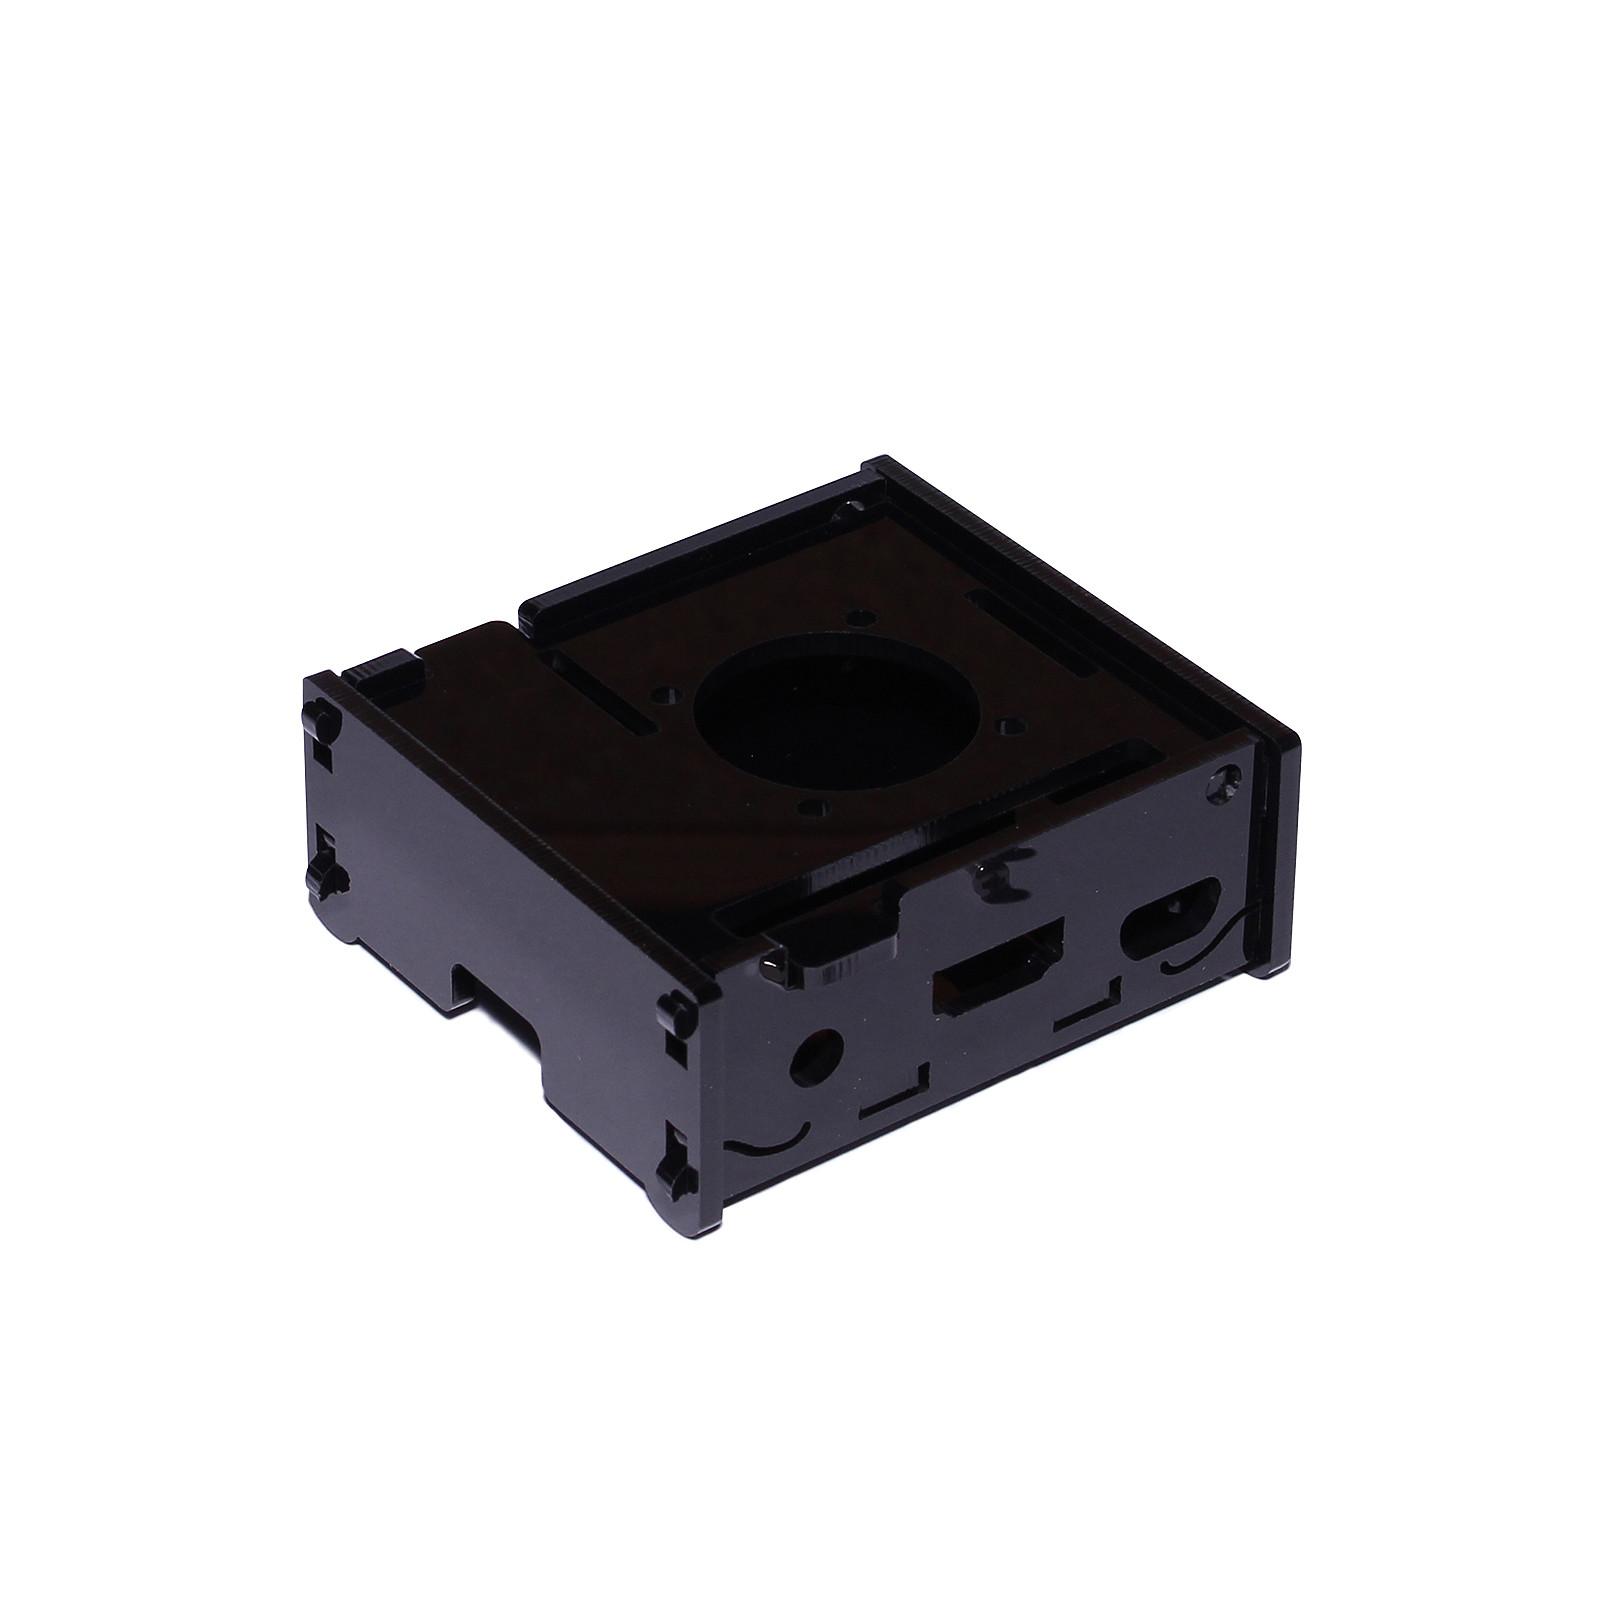 Estuche para frambuesa Pi 3 A+ con soporte para ventilador (negro)